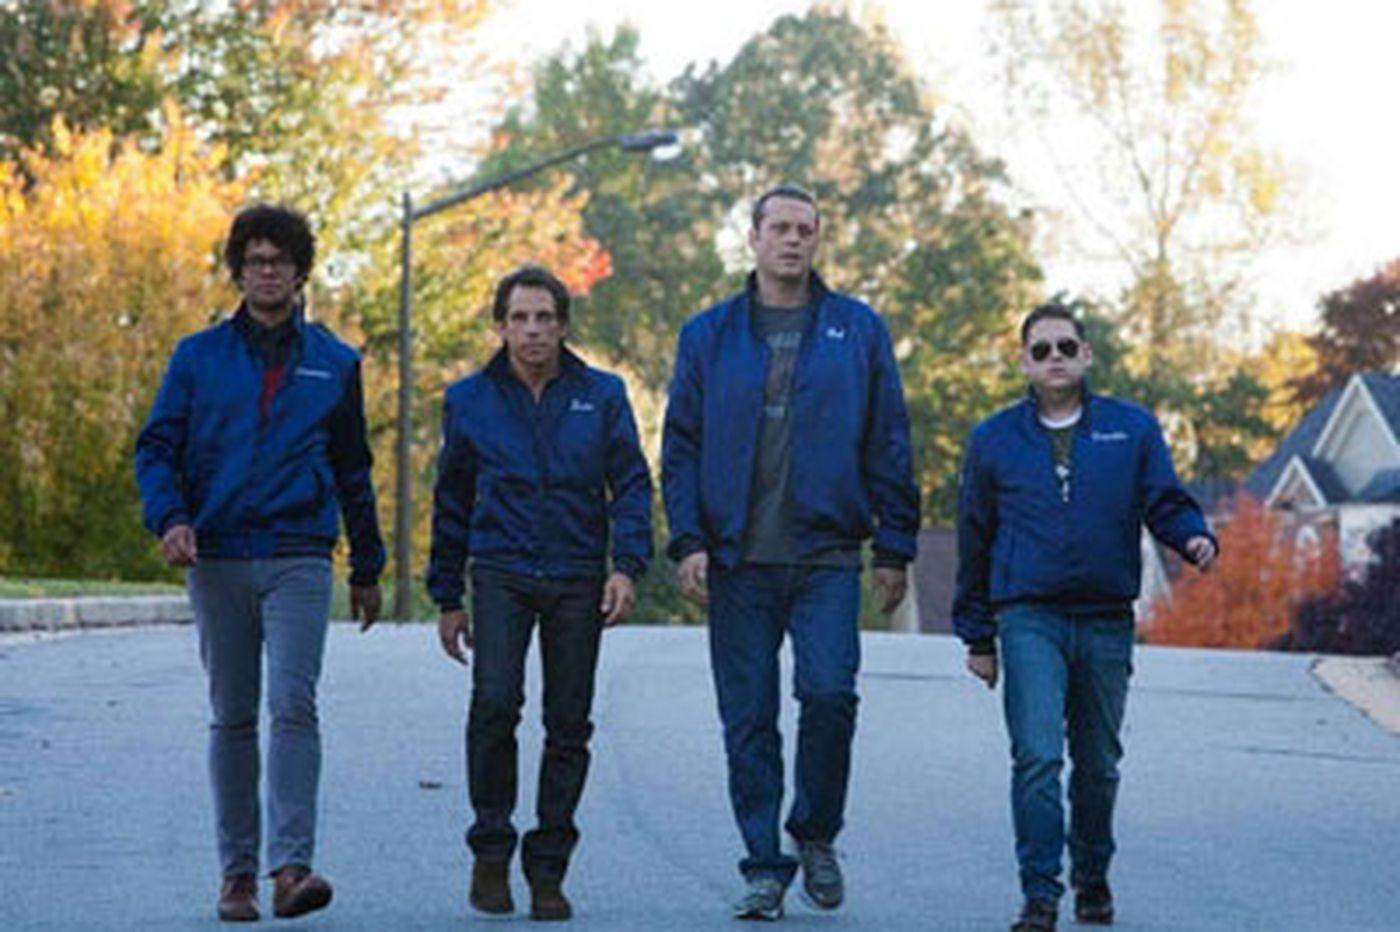 'The Watch': Neighborhood volunteers battle ooze monsters